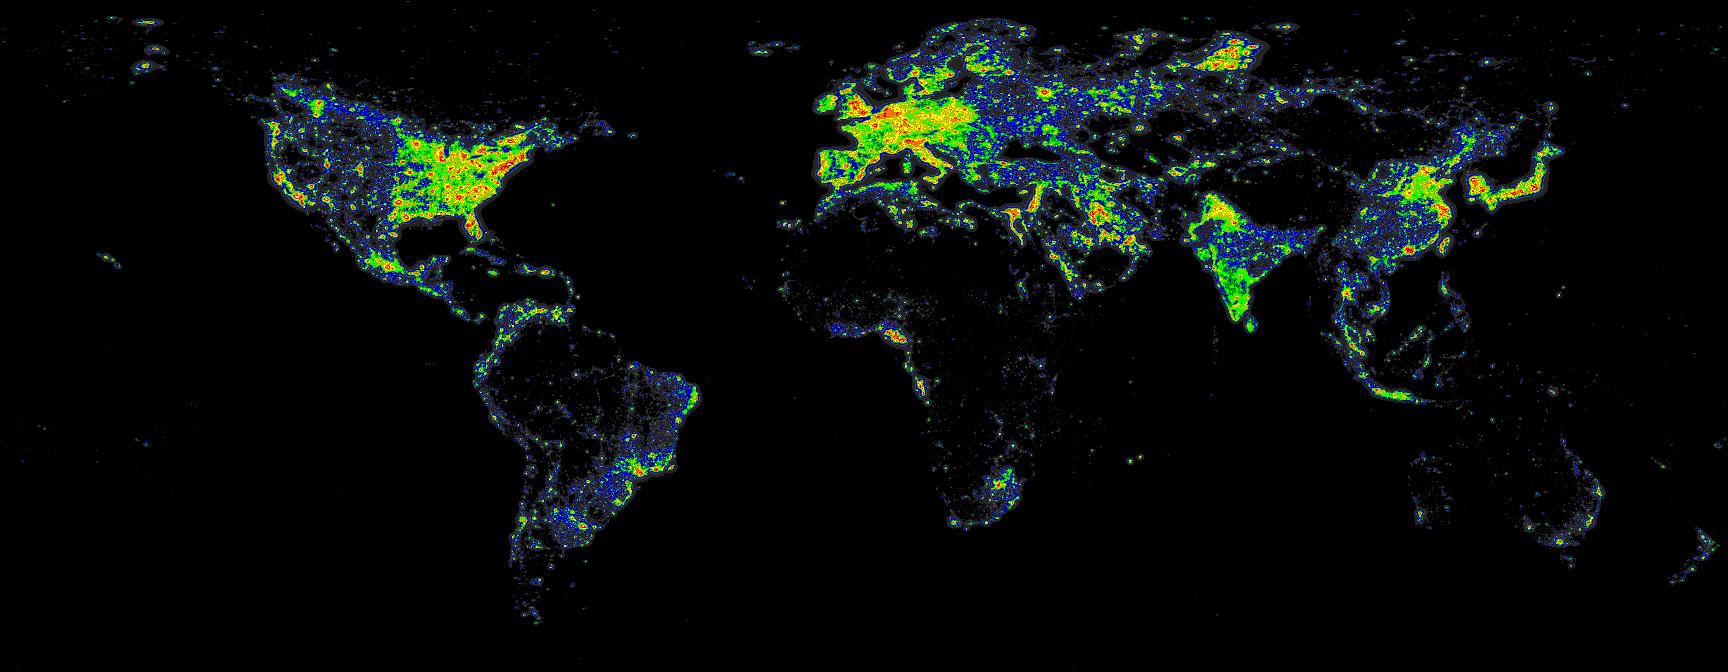 (Crédit: David Lorenz, Light Pollution Atlas 2006)